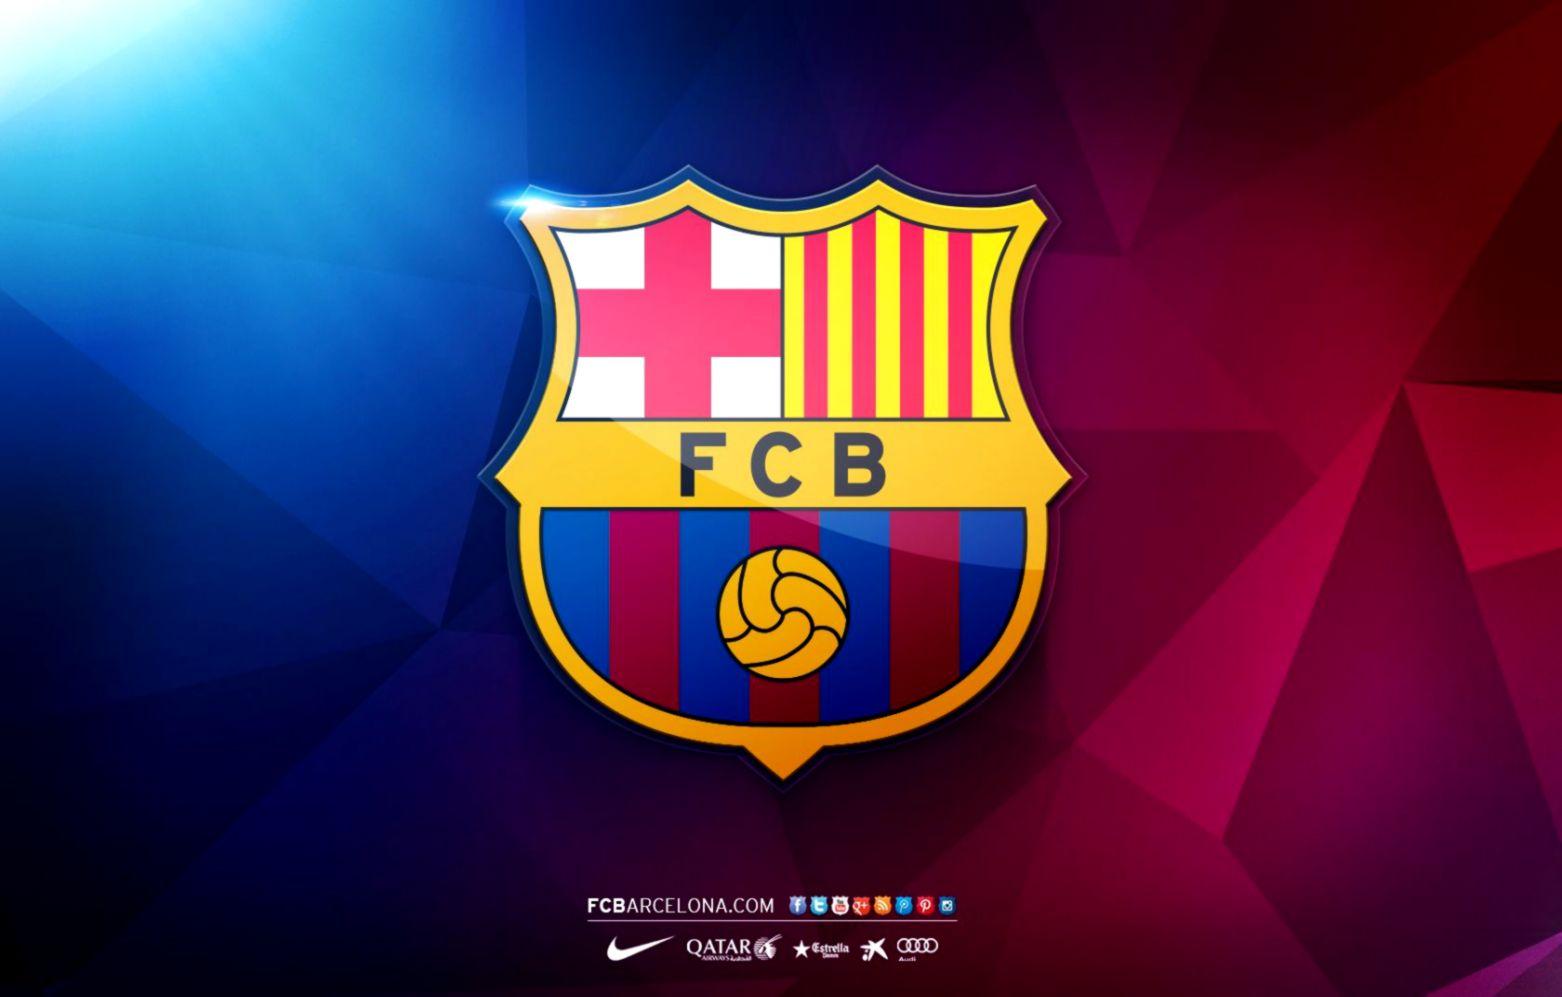 Fc Barcelona Team Wallpaper 2019 2020